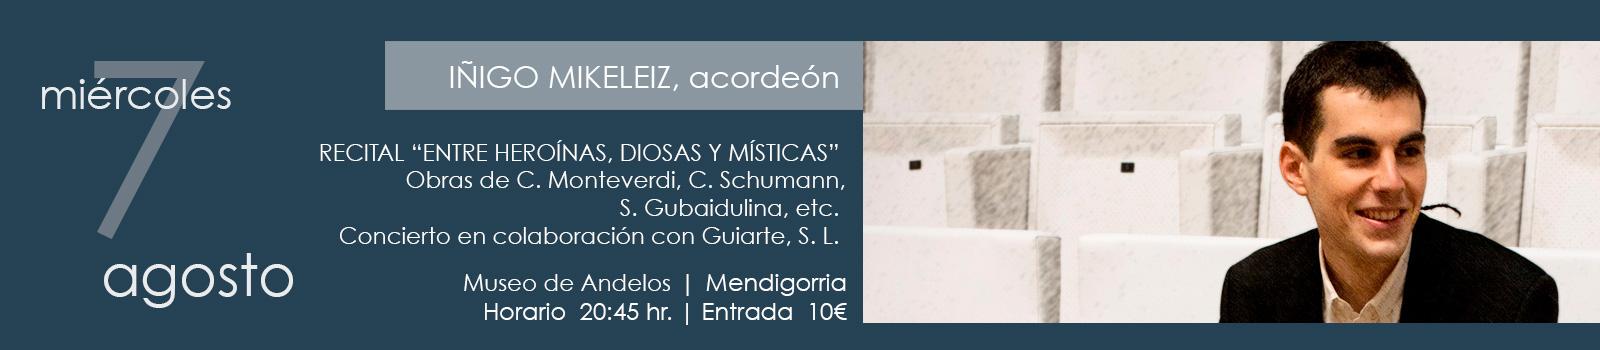 Festival Mendigorria - 7 agosto 2019